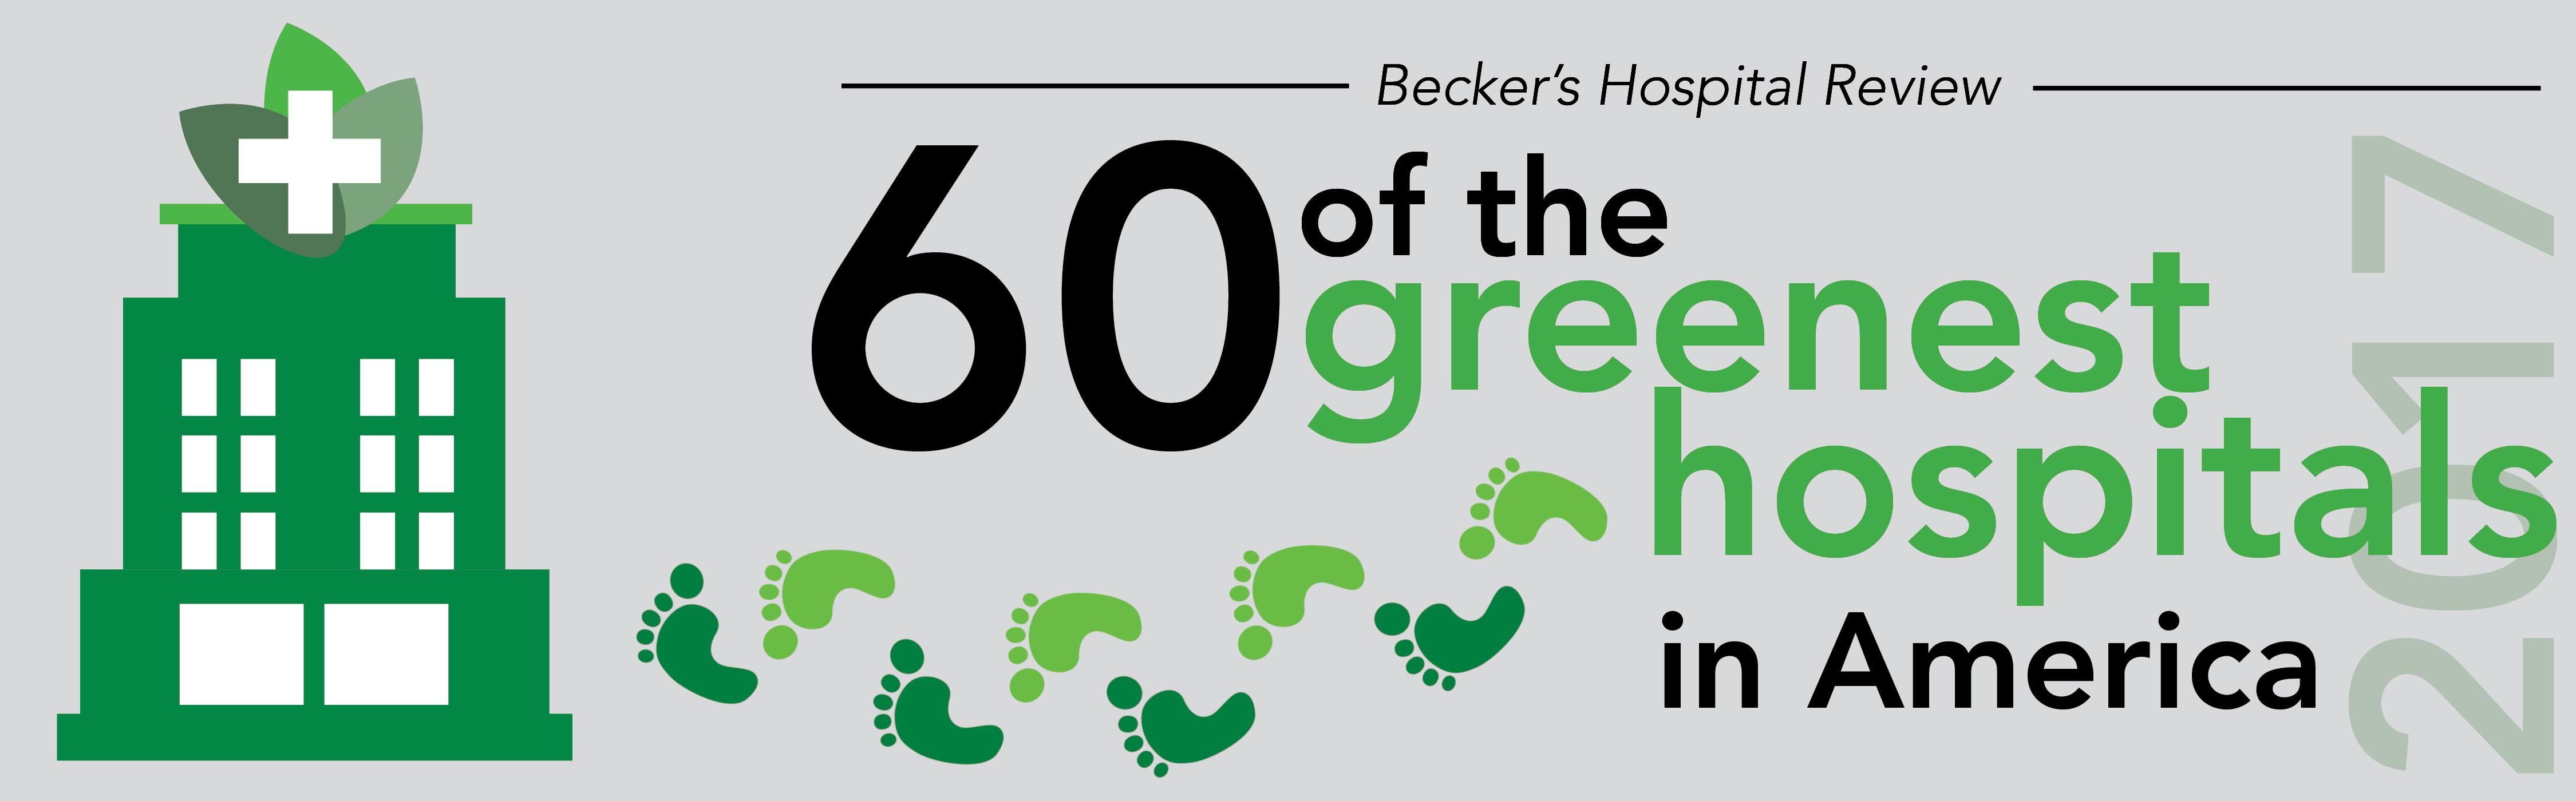 green hospitals logo 2017